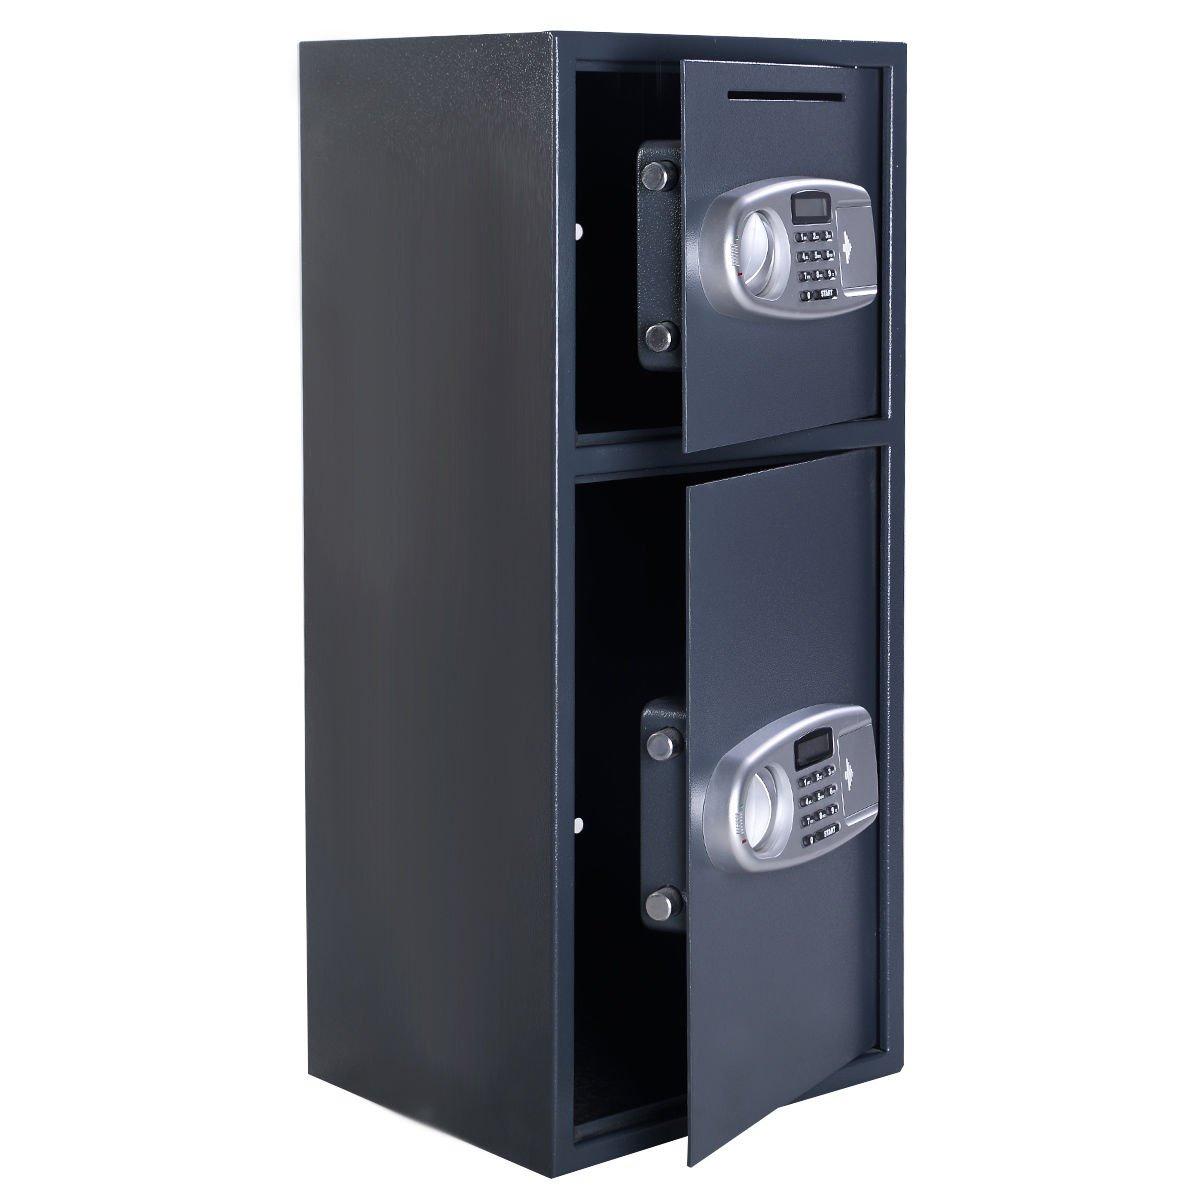 Double Door Digital Safe Depository Drop Box Safes Cash Office Security Lock (Brand New)